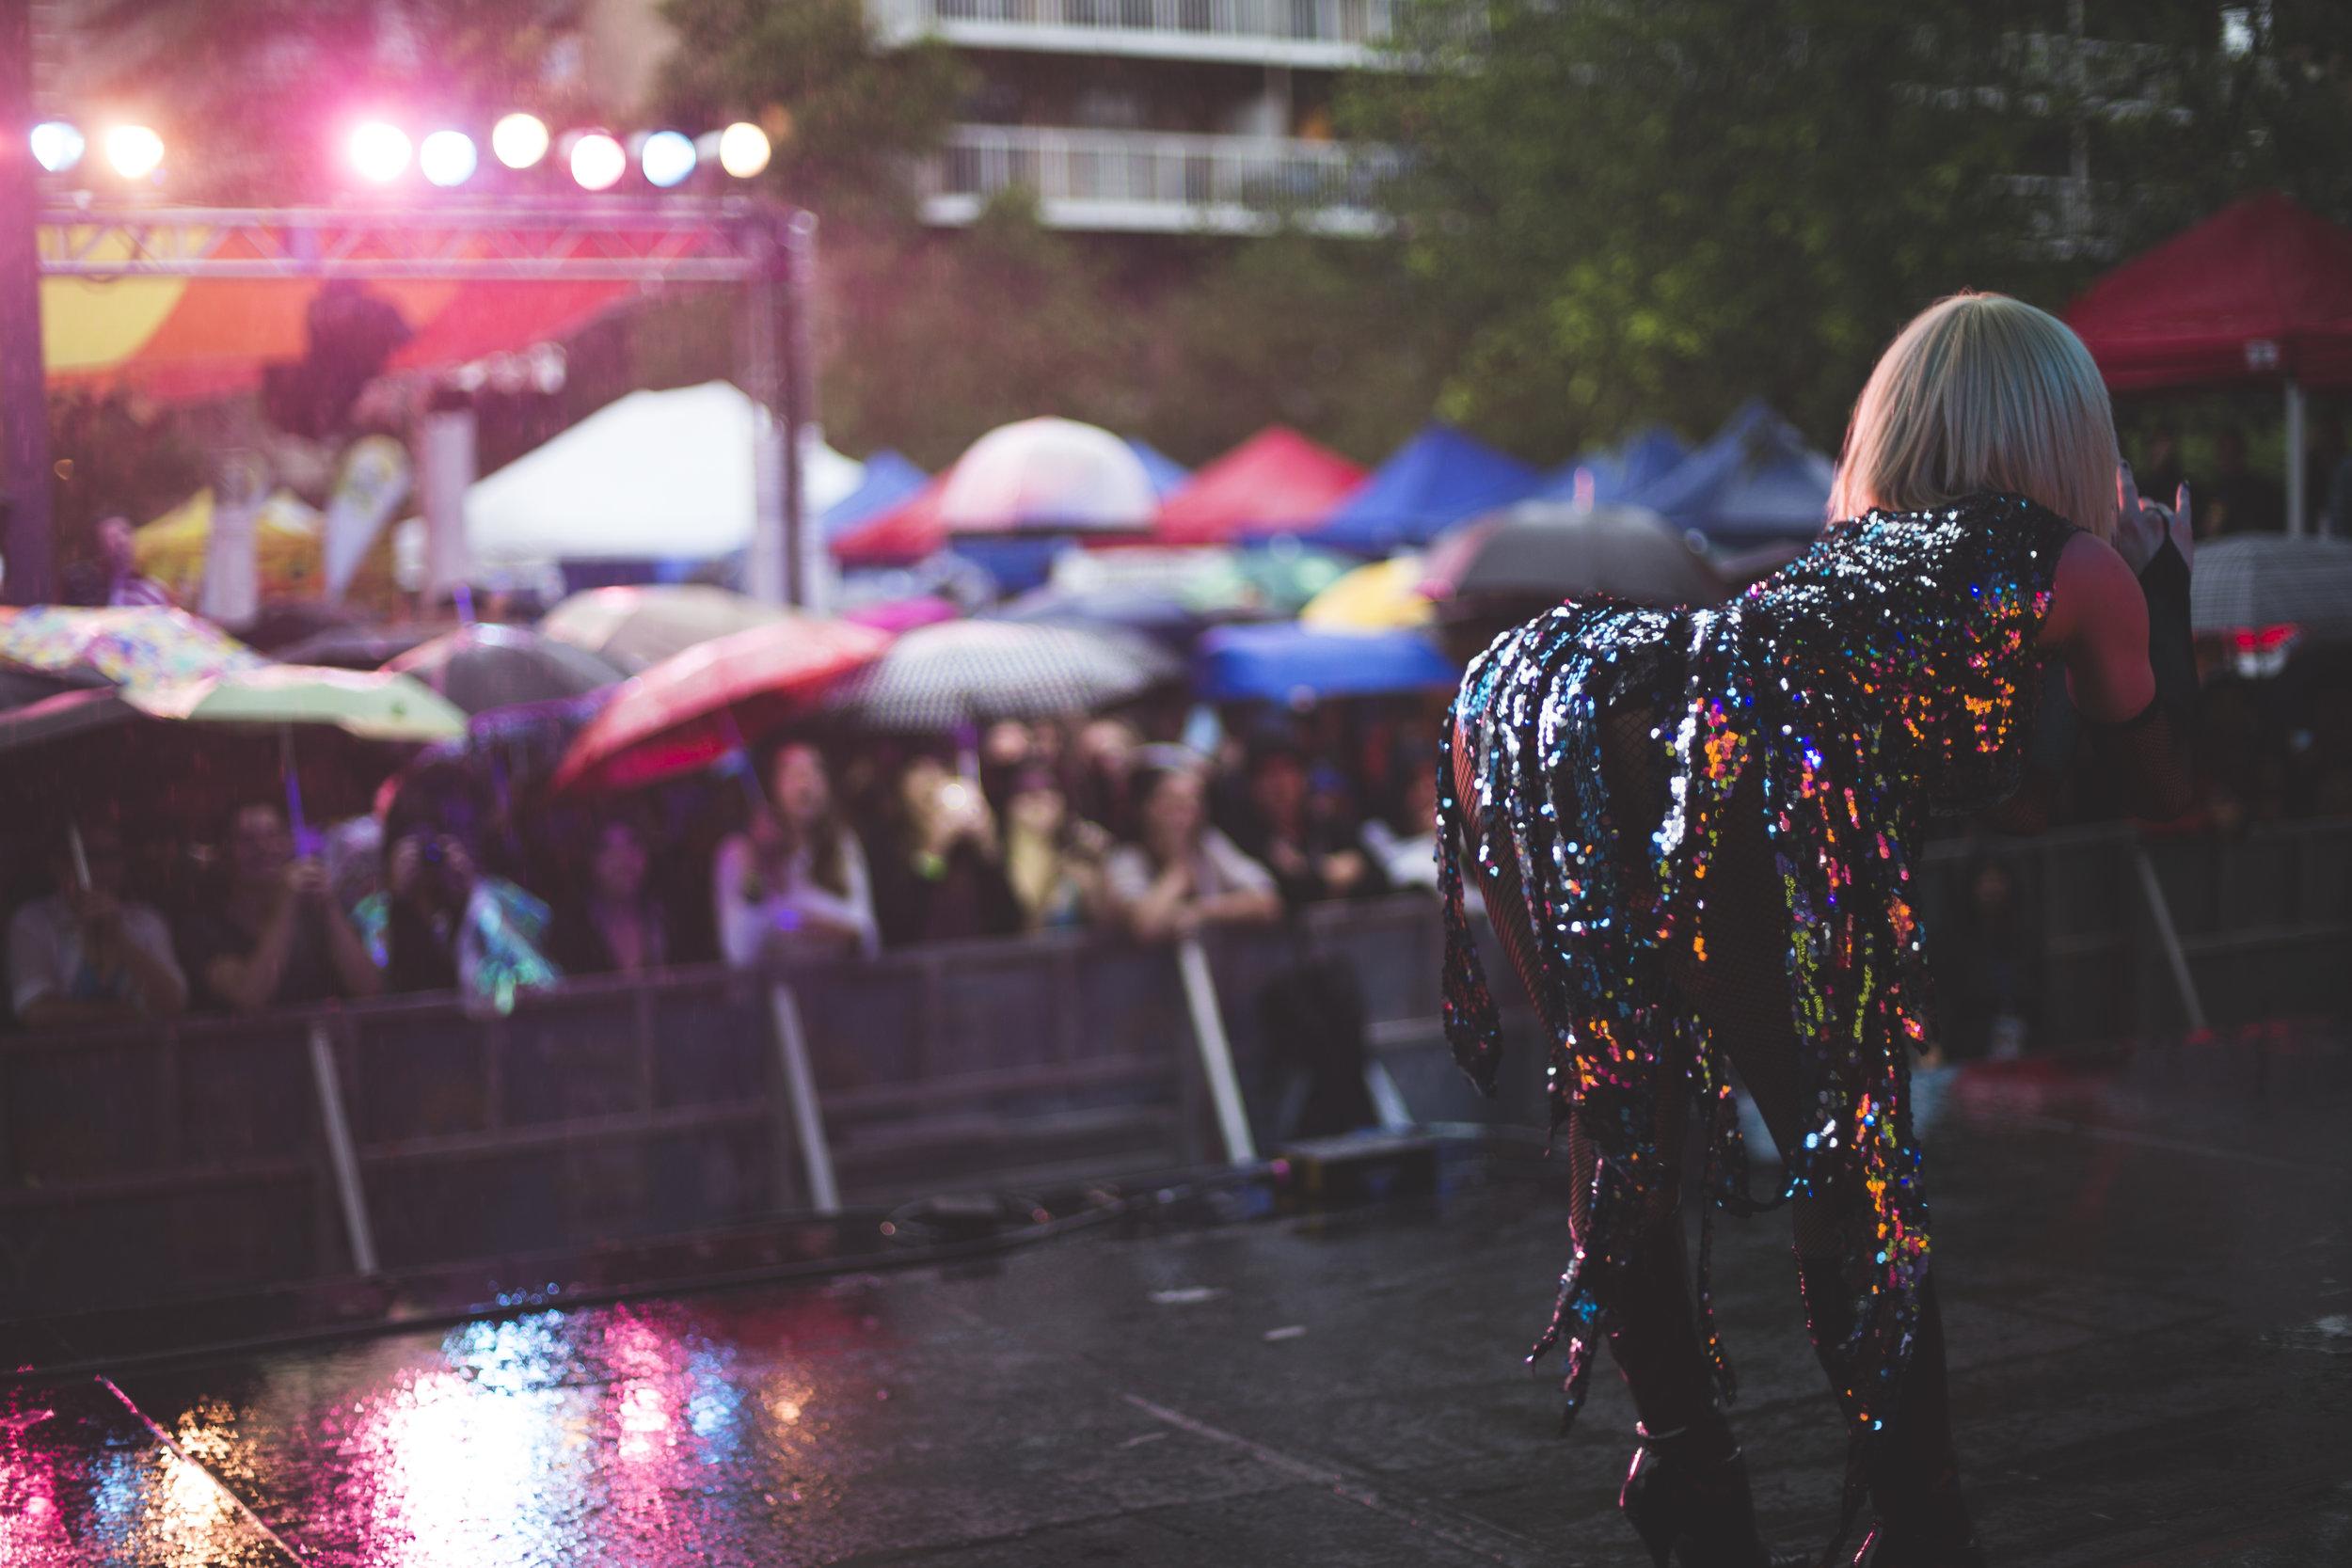 Pride_Toronto_2015_Drag_On_by_Indeana_Underhill-16.jpg